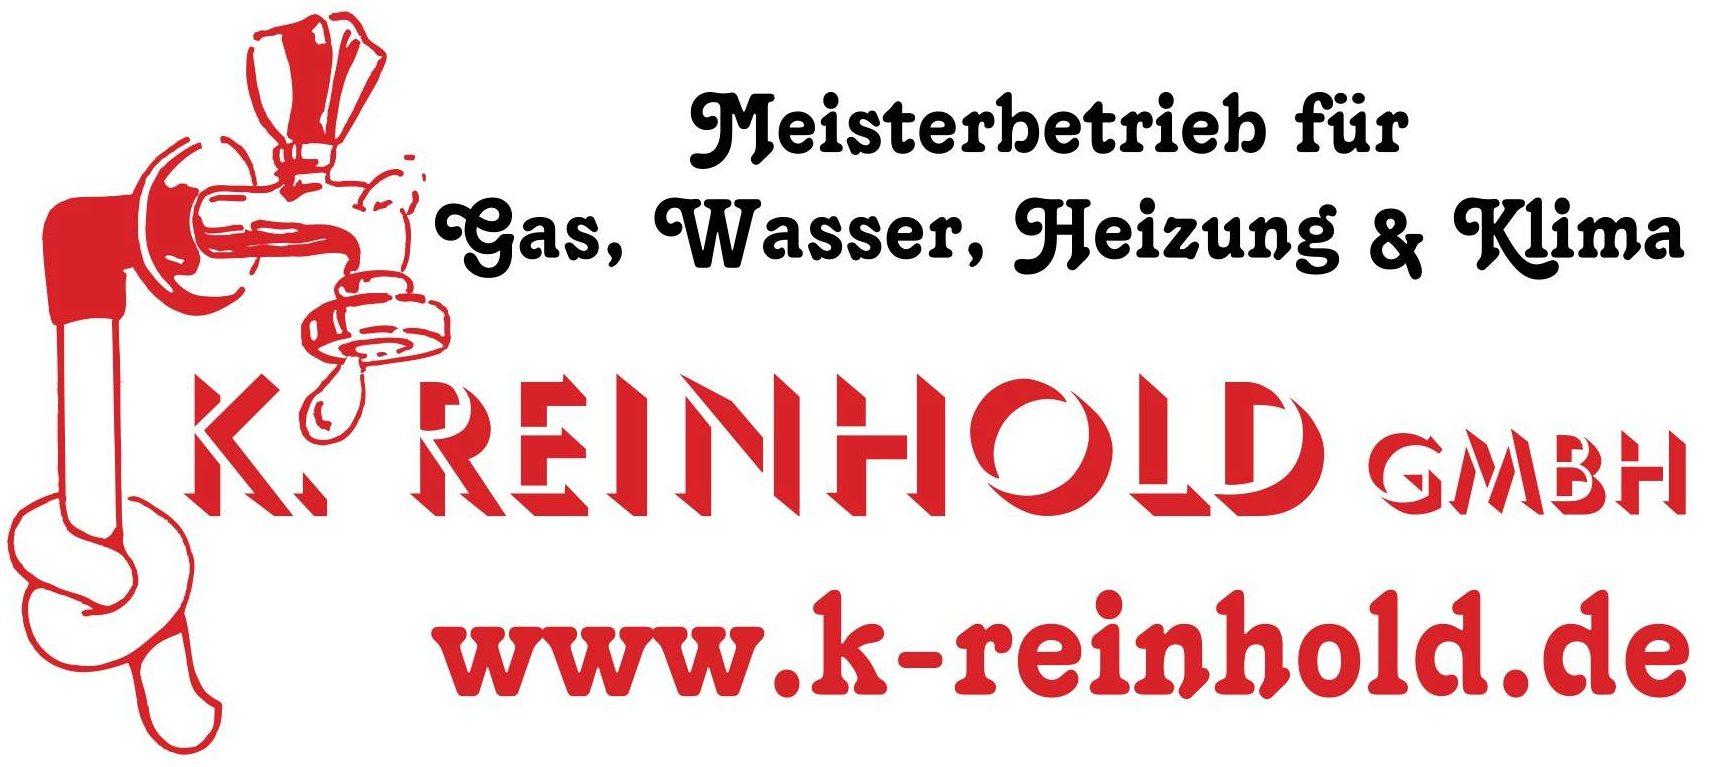 K.Reinhold GmbH